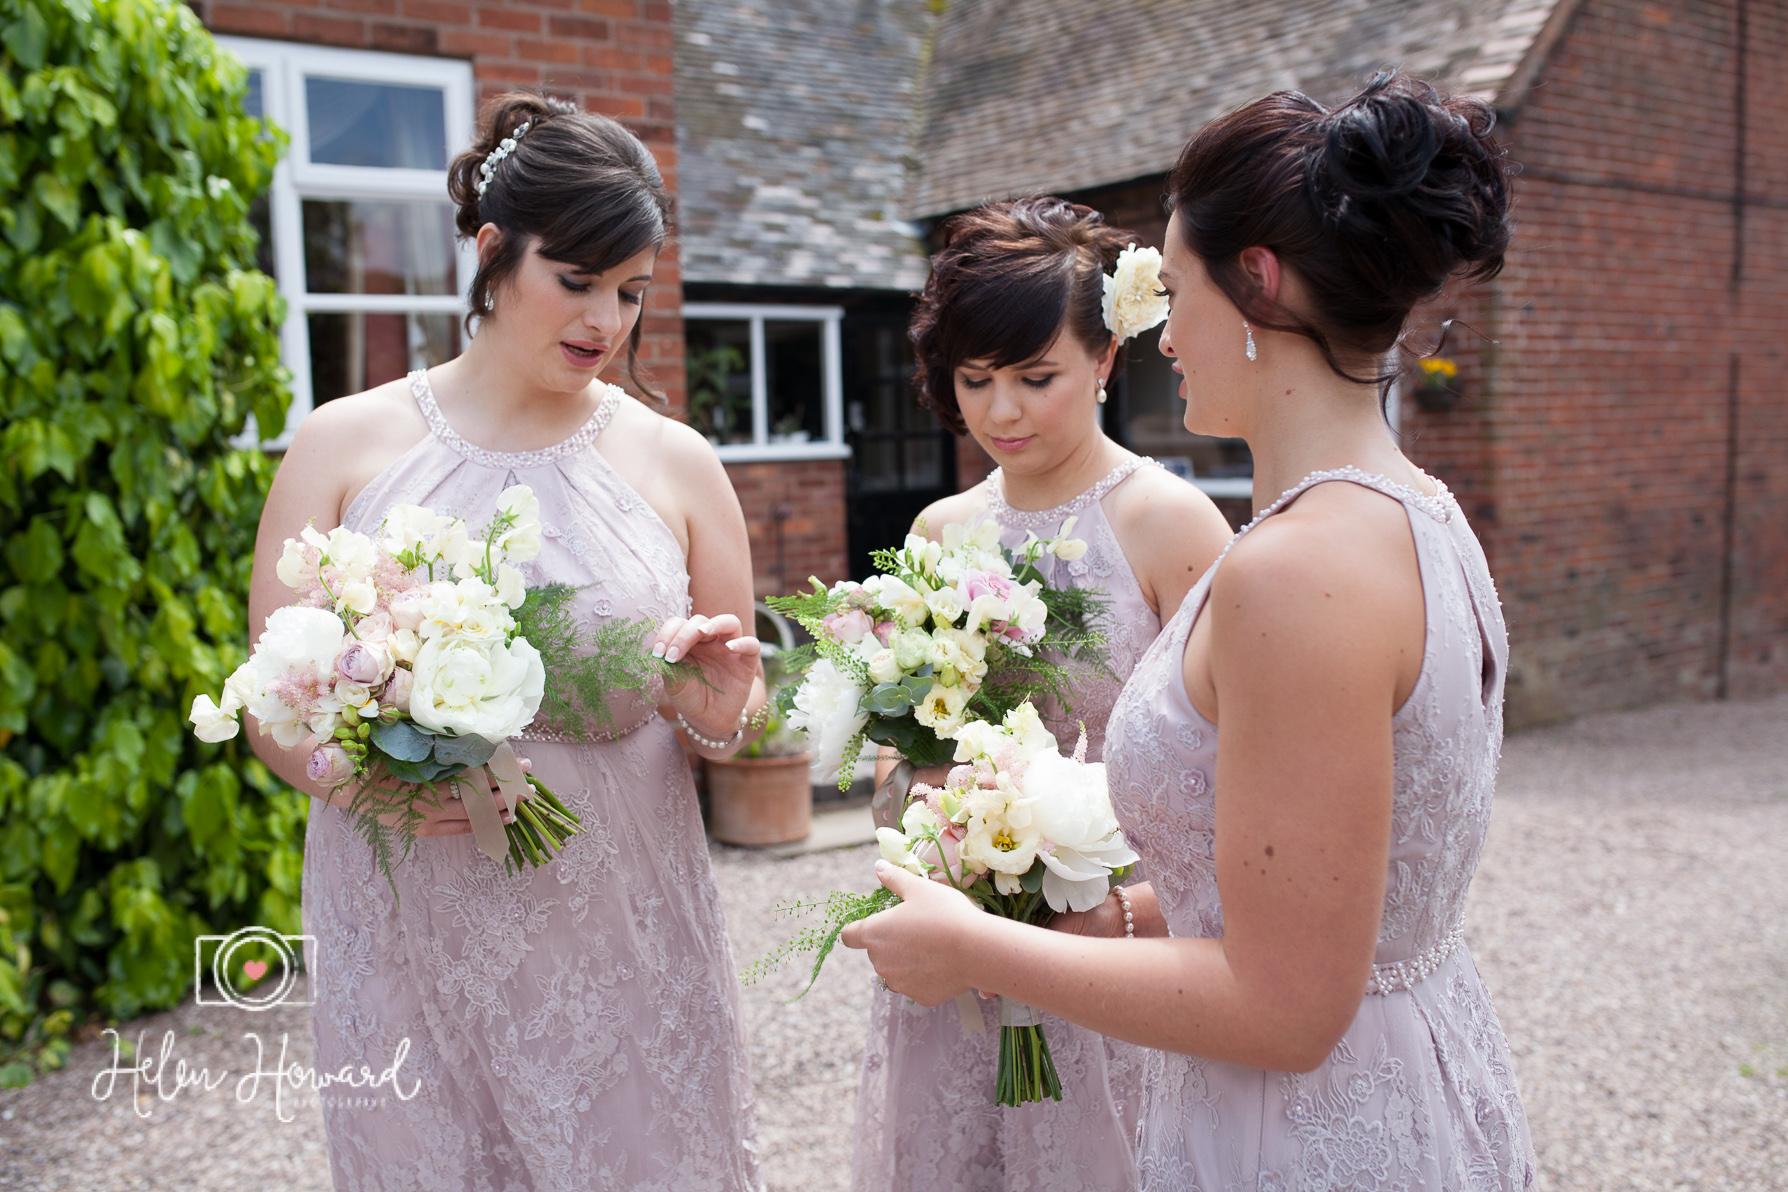 Helen Howard Photography Packington Moor Wedding-57.jpg